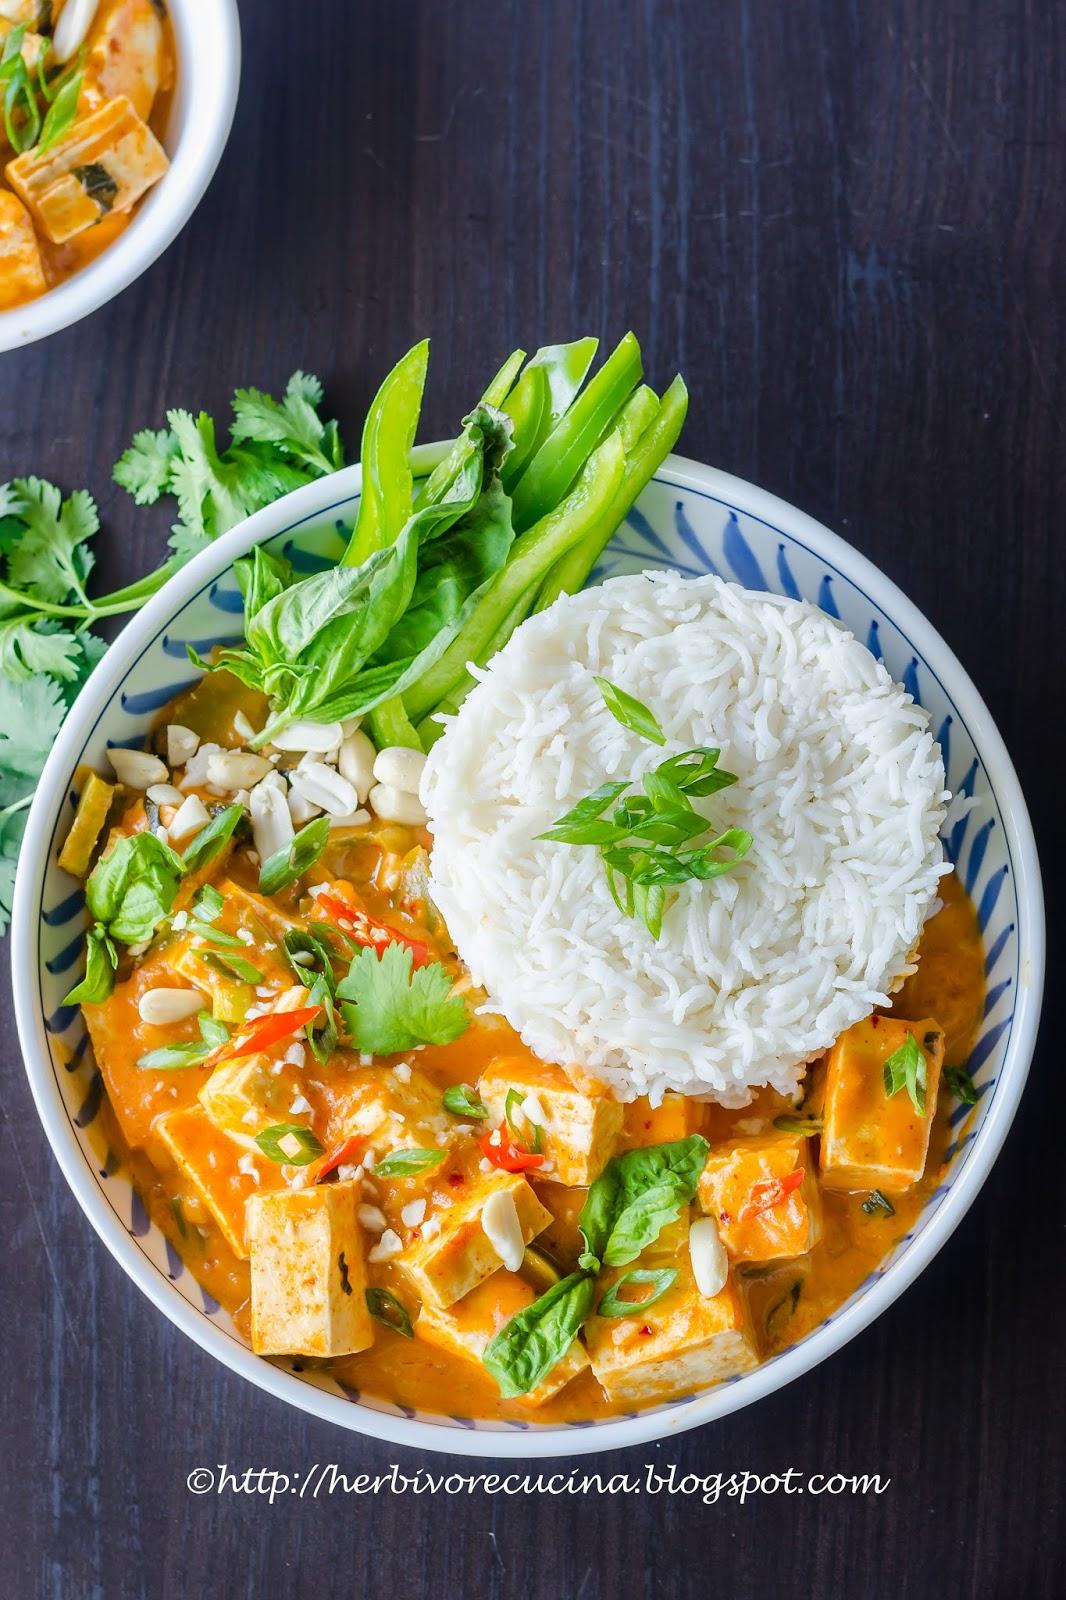 Herbivore Cucina: Tofu Panang Curry